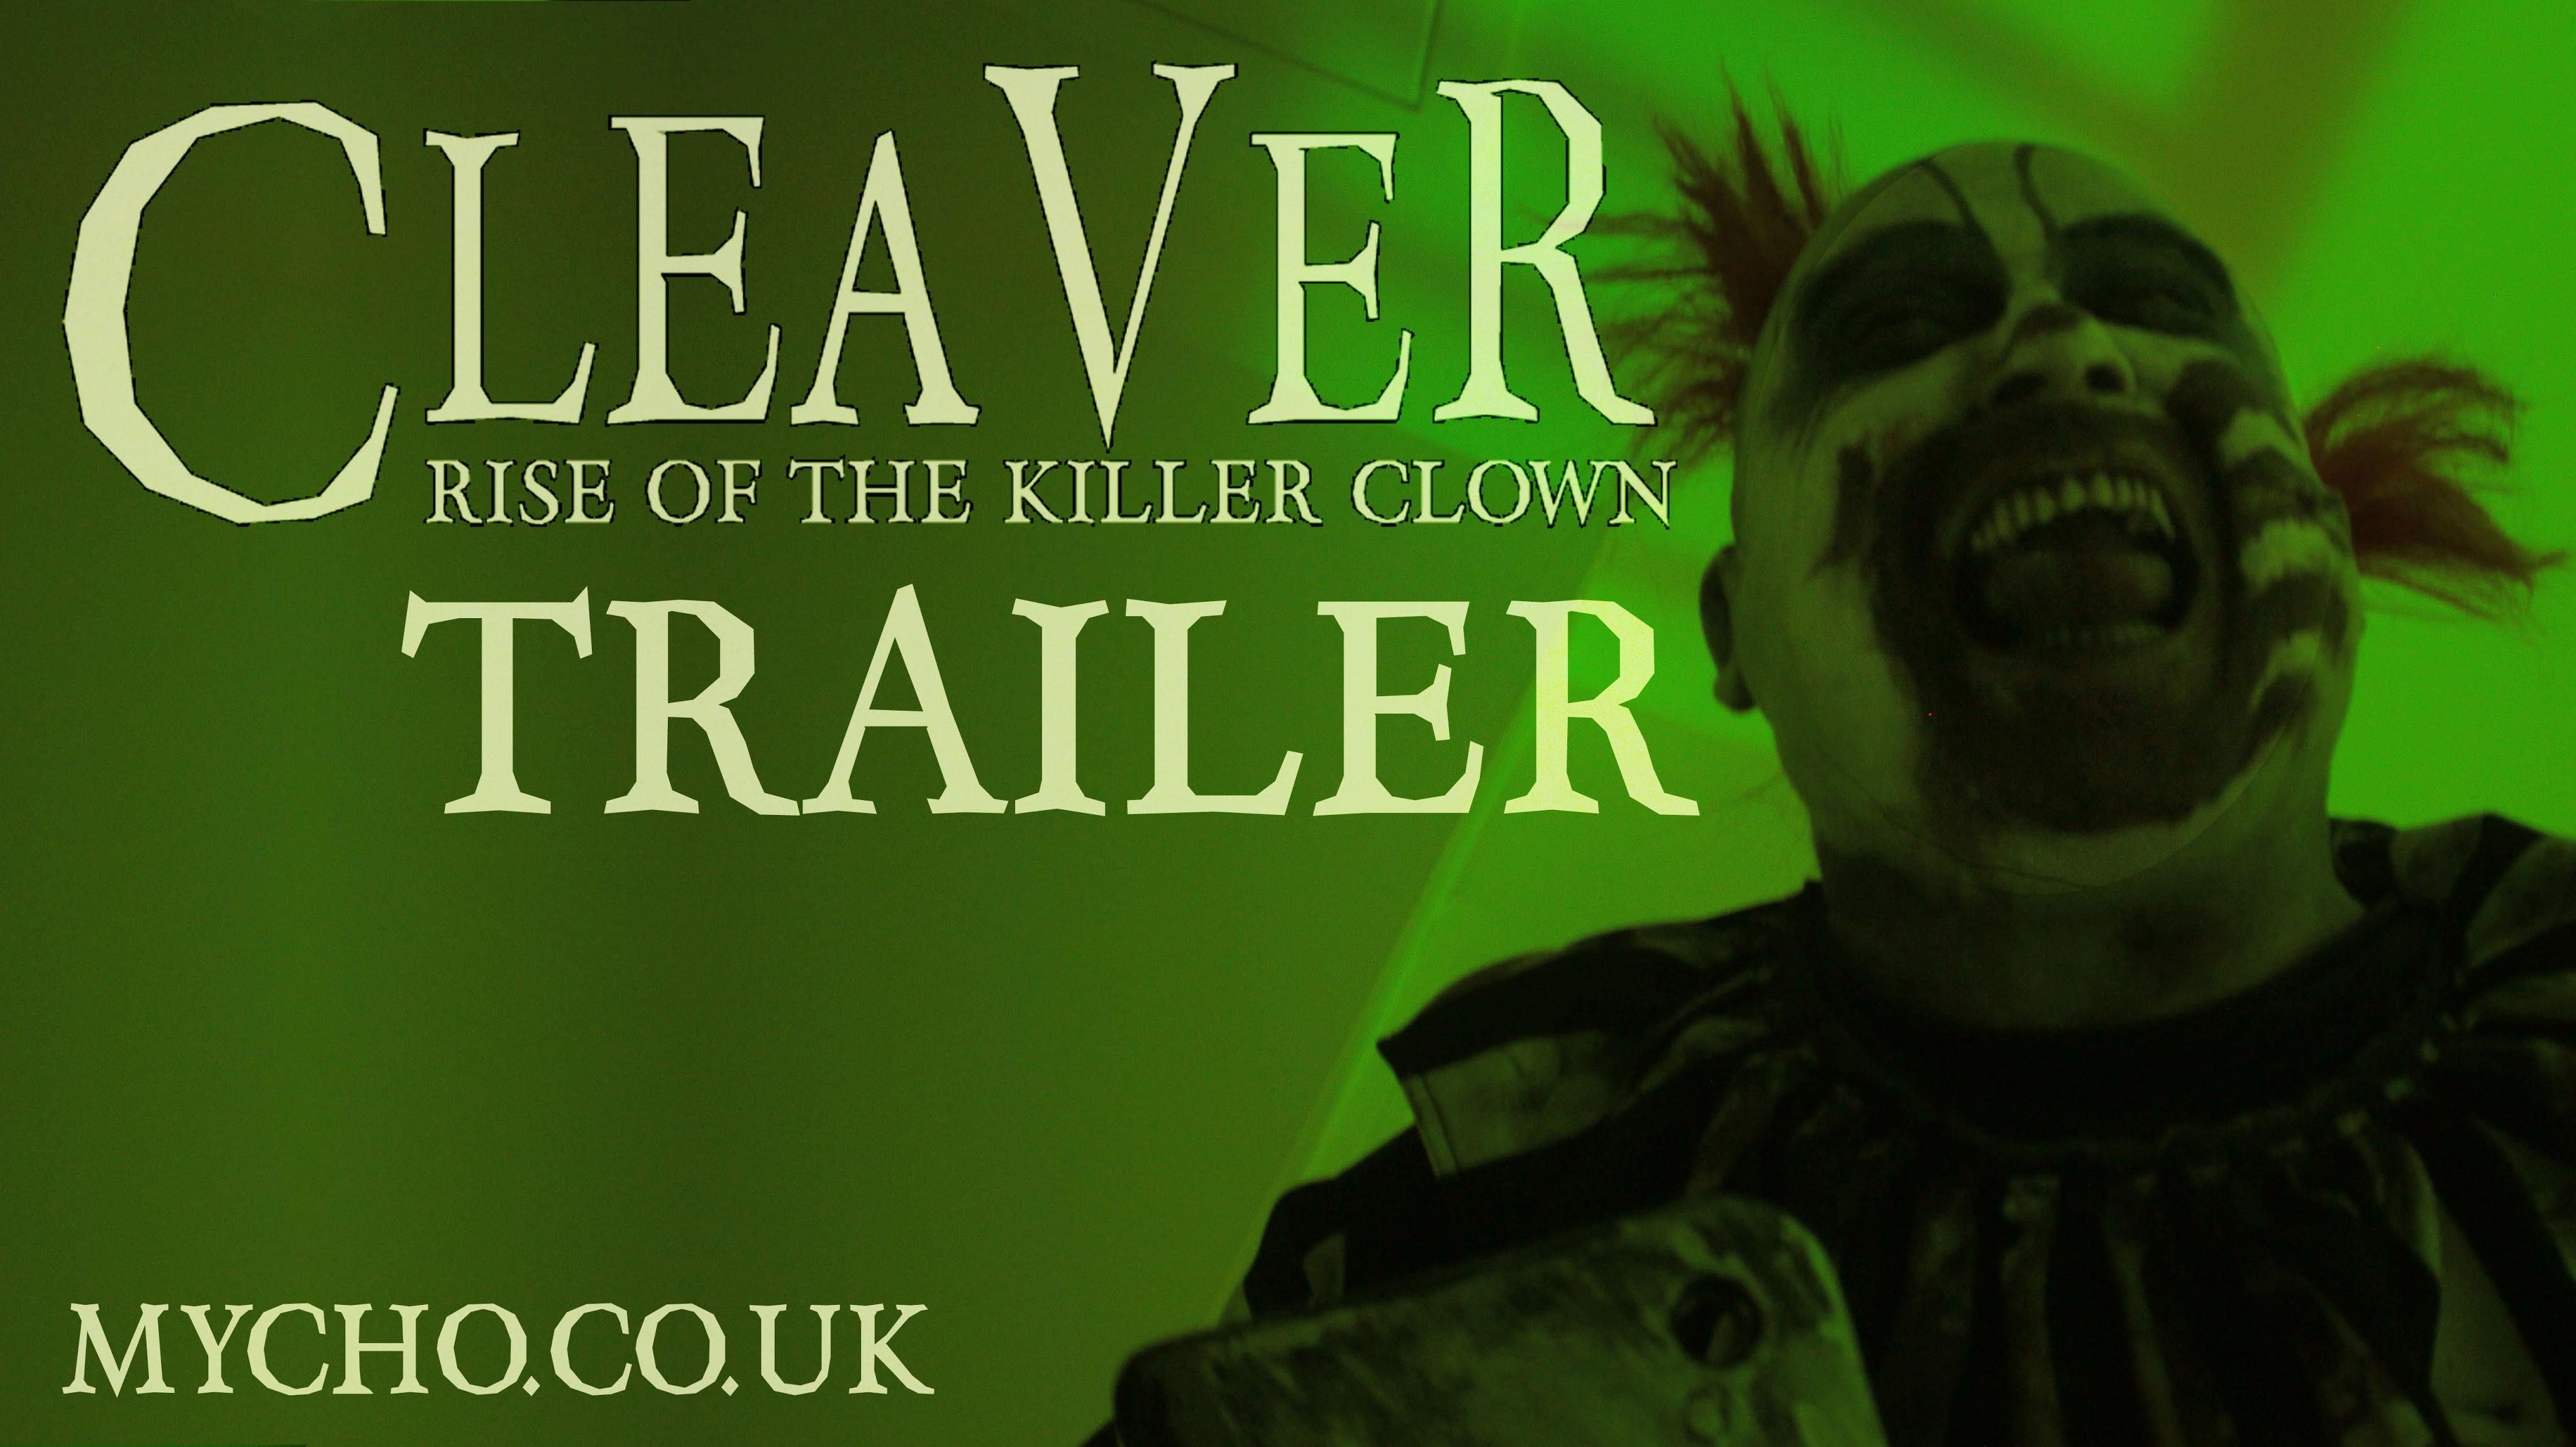 "Der Trailer zum Film ""Cleaver: Rise of the Killer Clown"" zeigt uns… halt… furchtbare Clowns"